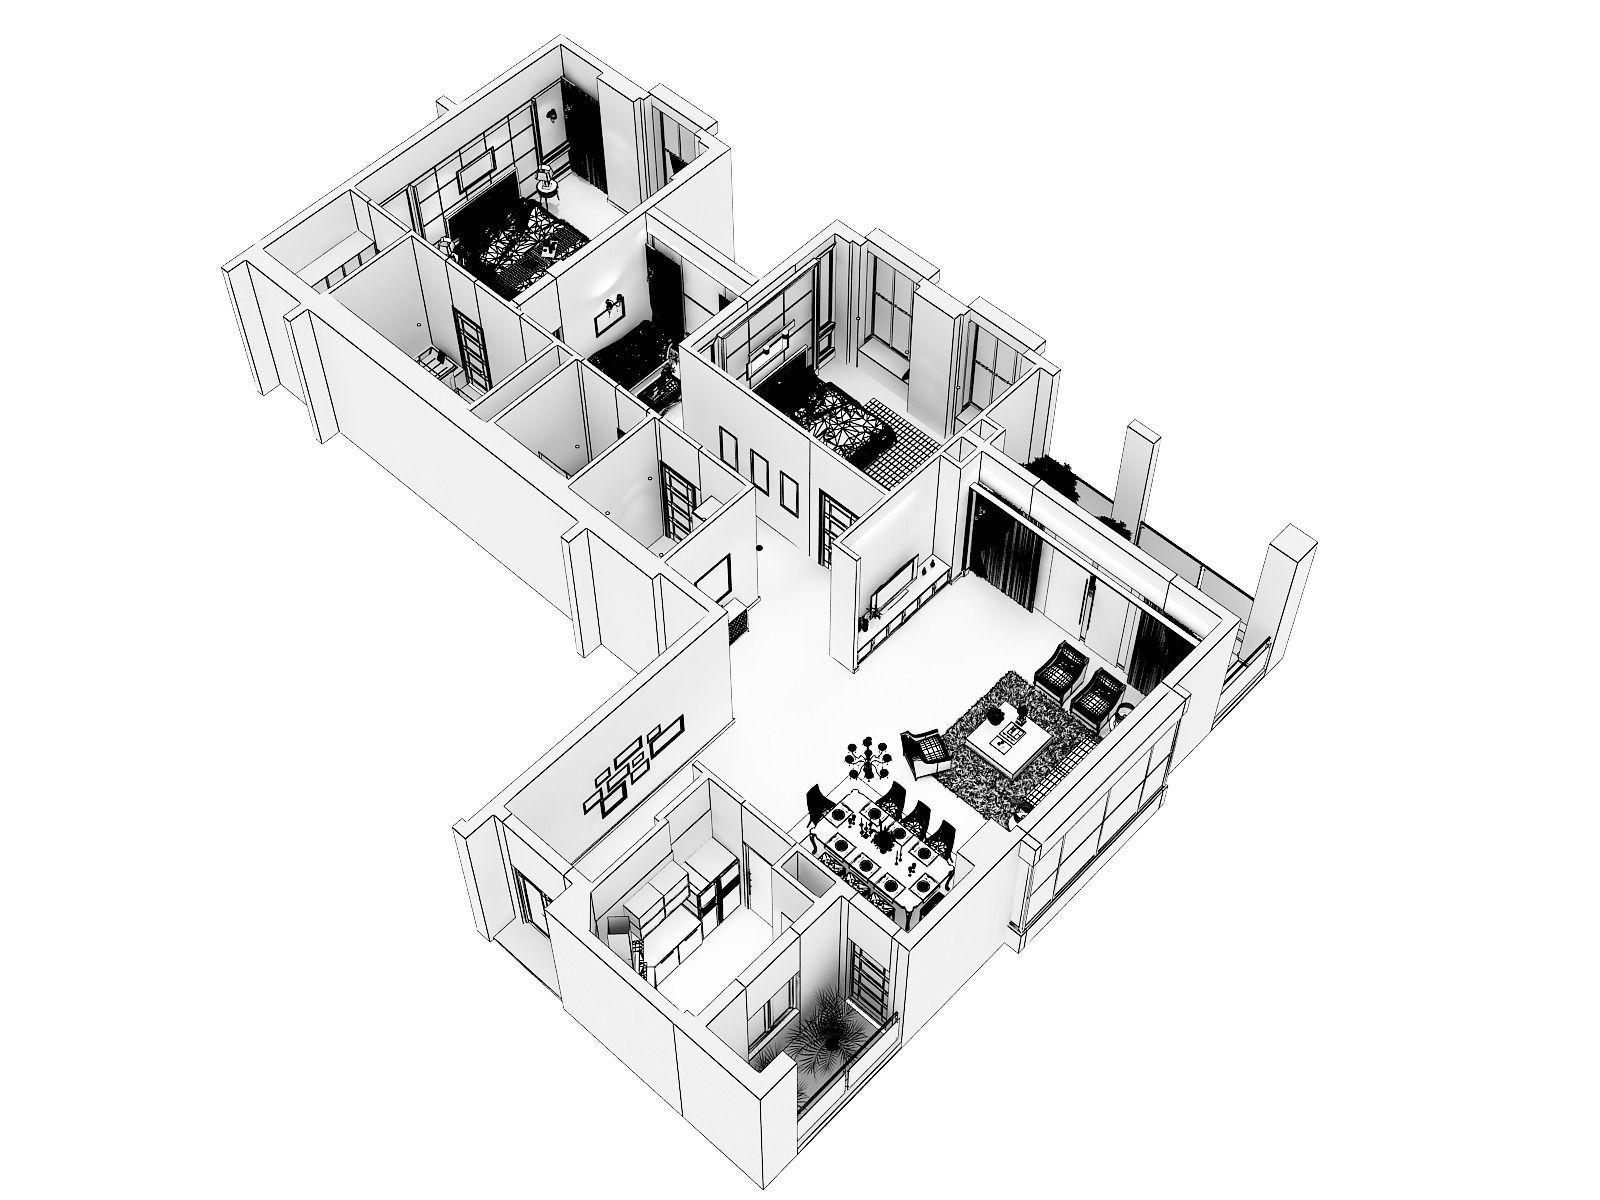 cutaway residential building 3d model cgtrader AutoCAD 3D Tutorial